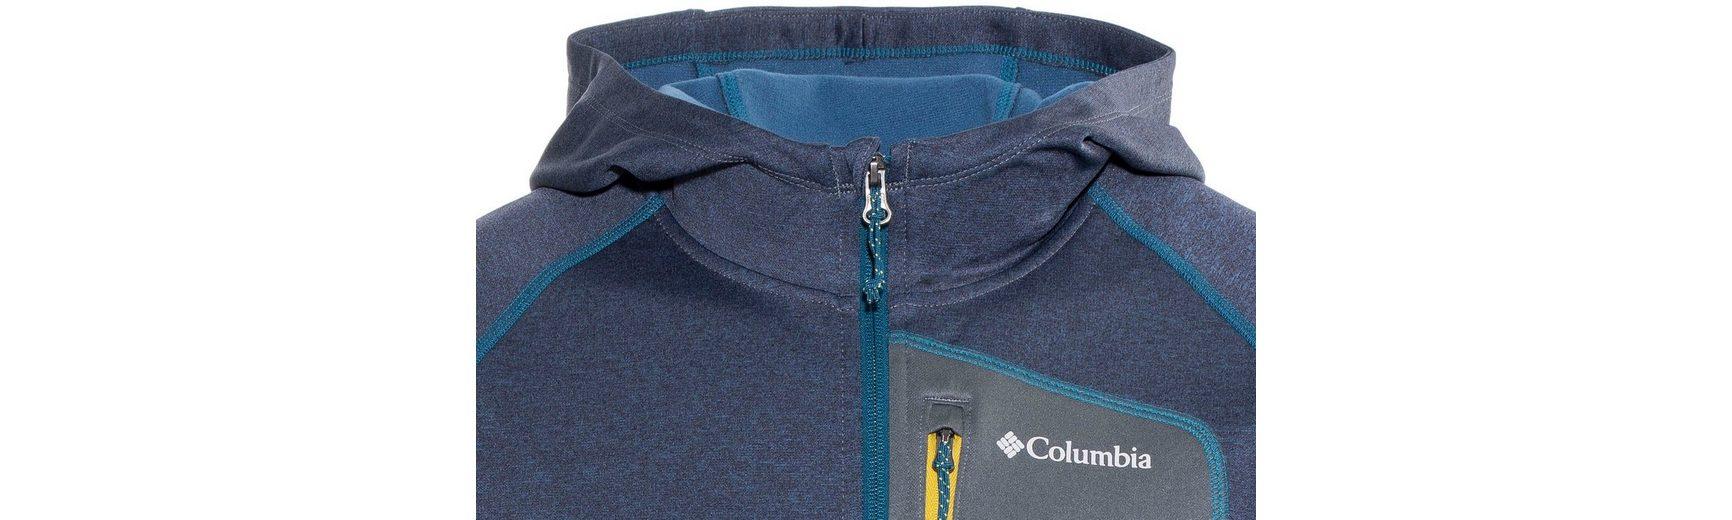 Columbia Outdoorjacke Jackson Creek II Hoodie Men Größte Anbieter Verkauf Online yM2clM